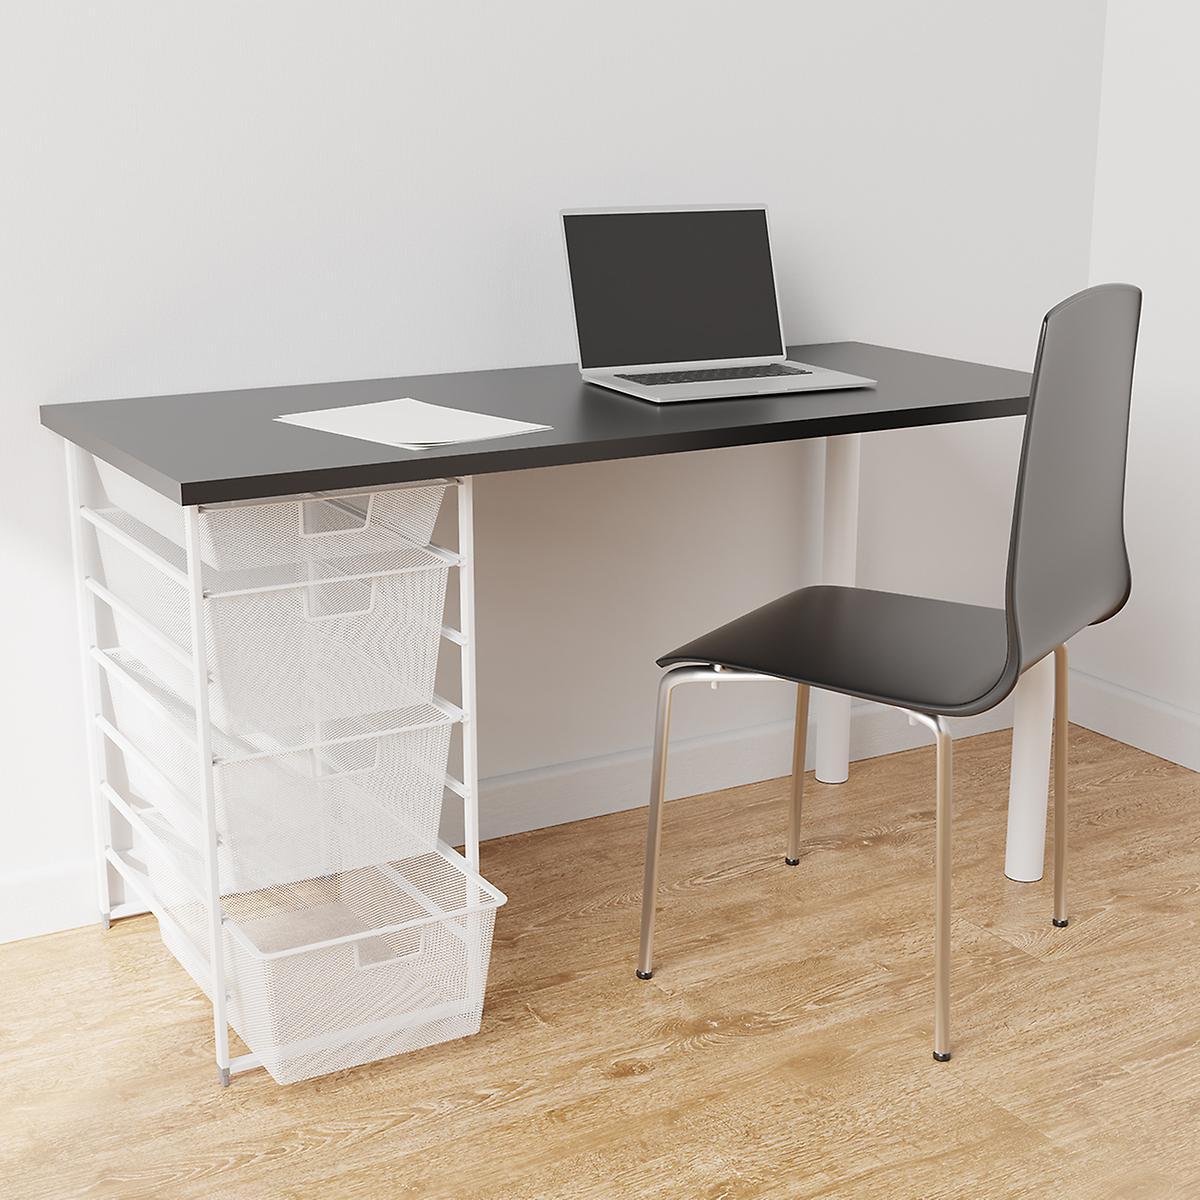 Elfa White & Slate Desk with Drawers